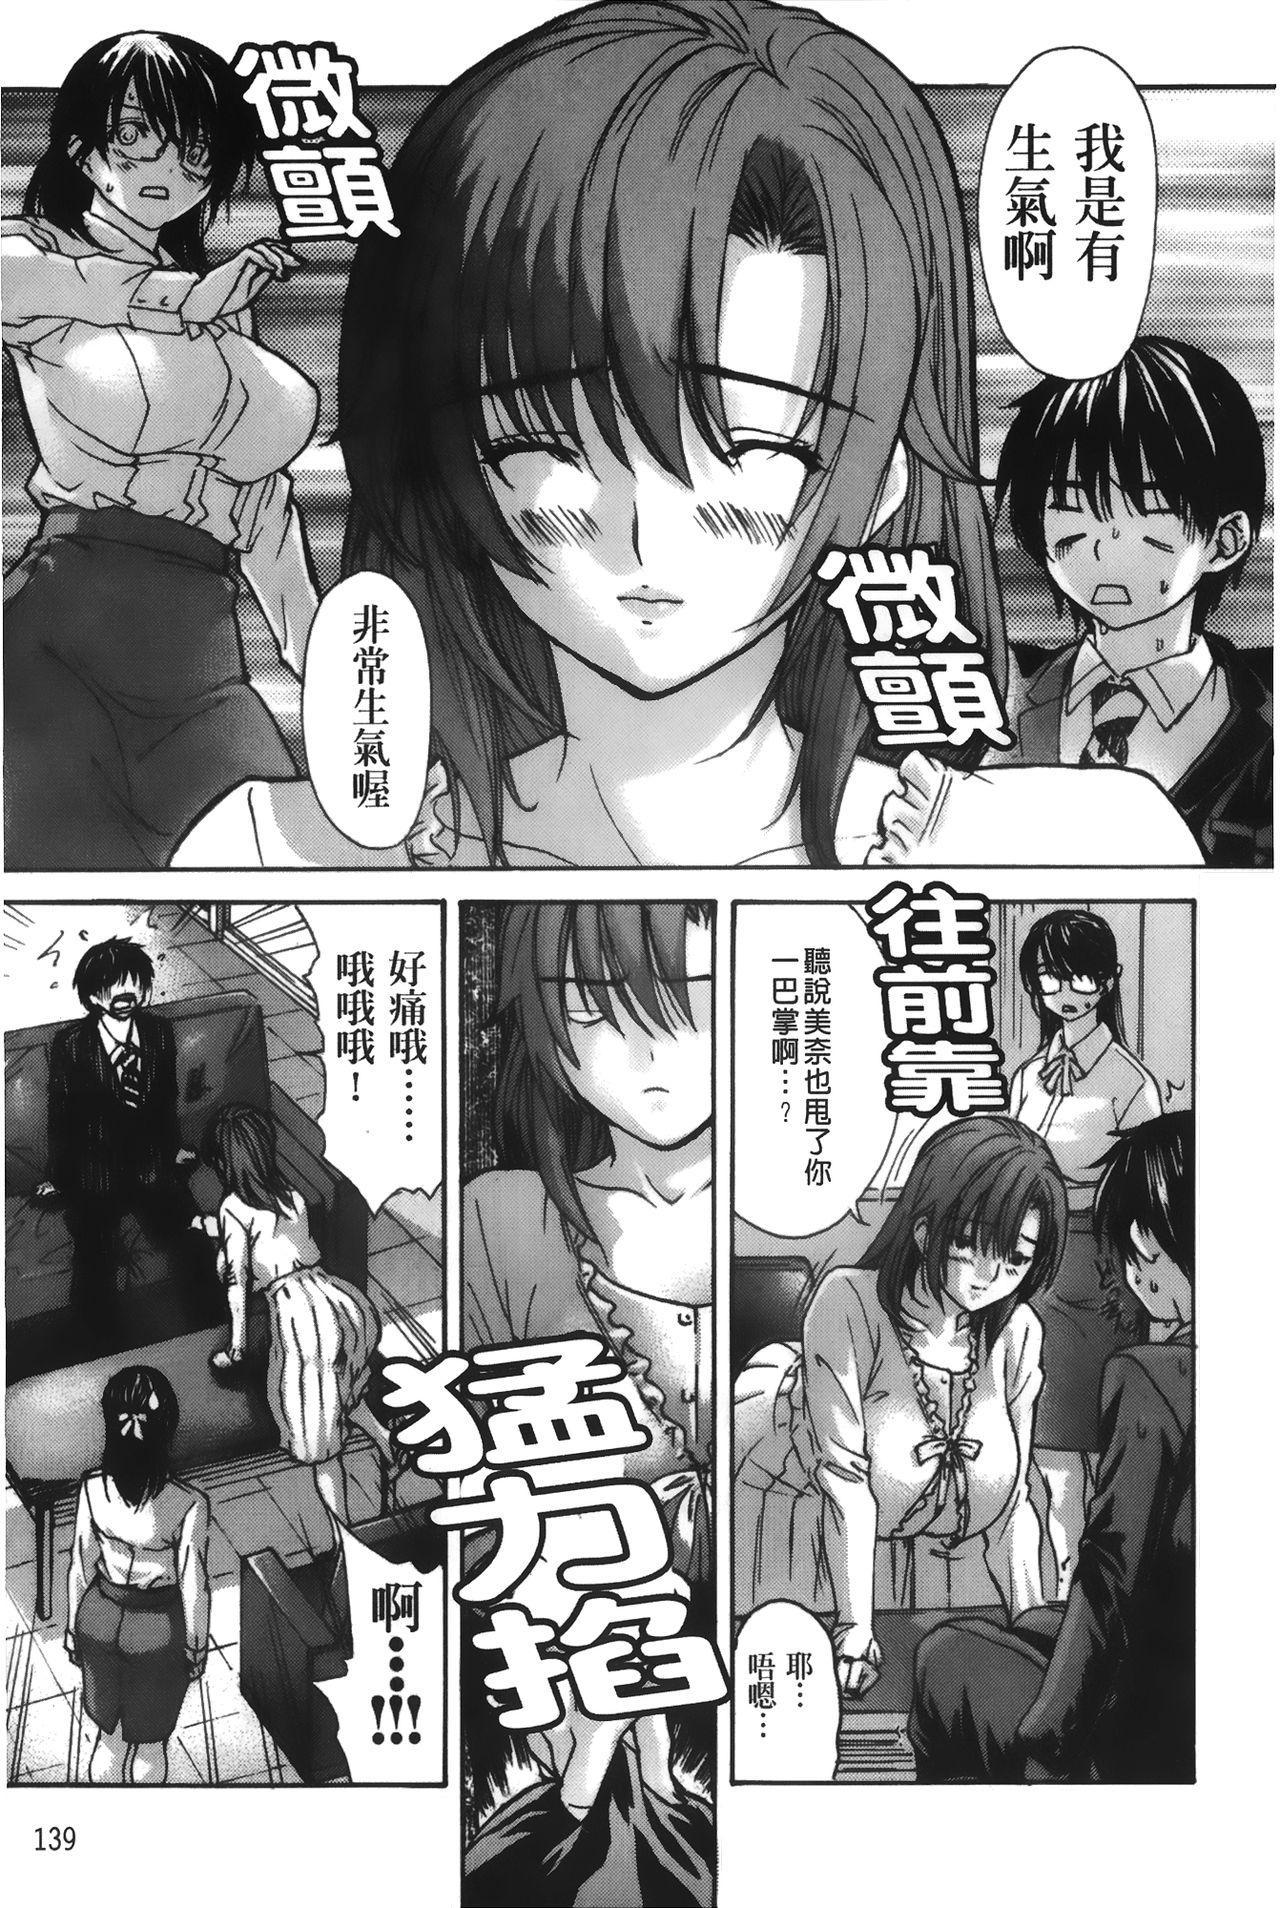 Tonari no Minano Sensei 4 | 隔壁的美奈乃老師 4 140